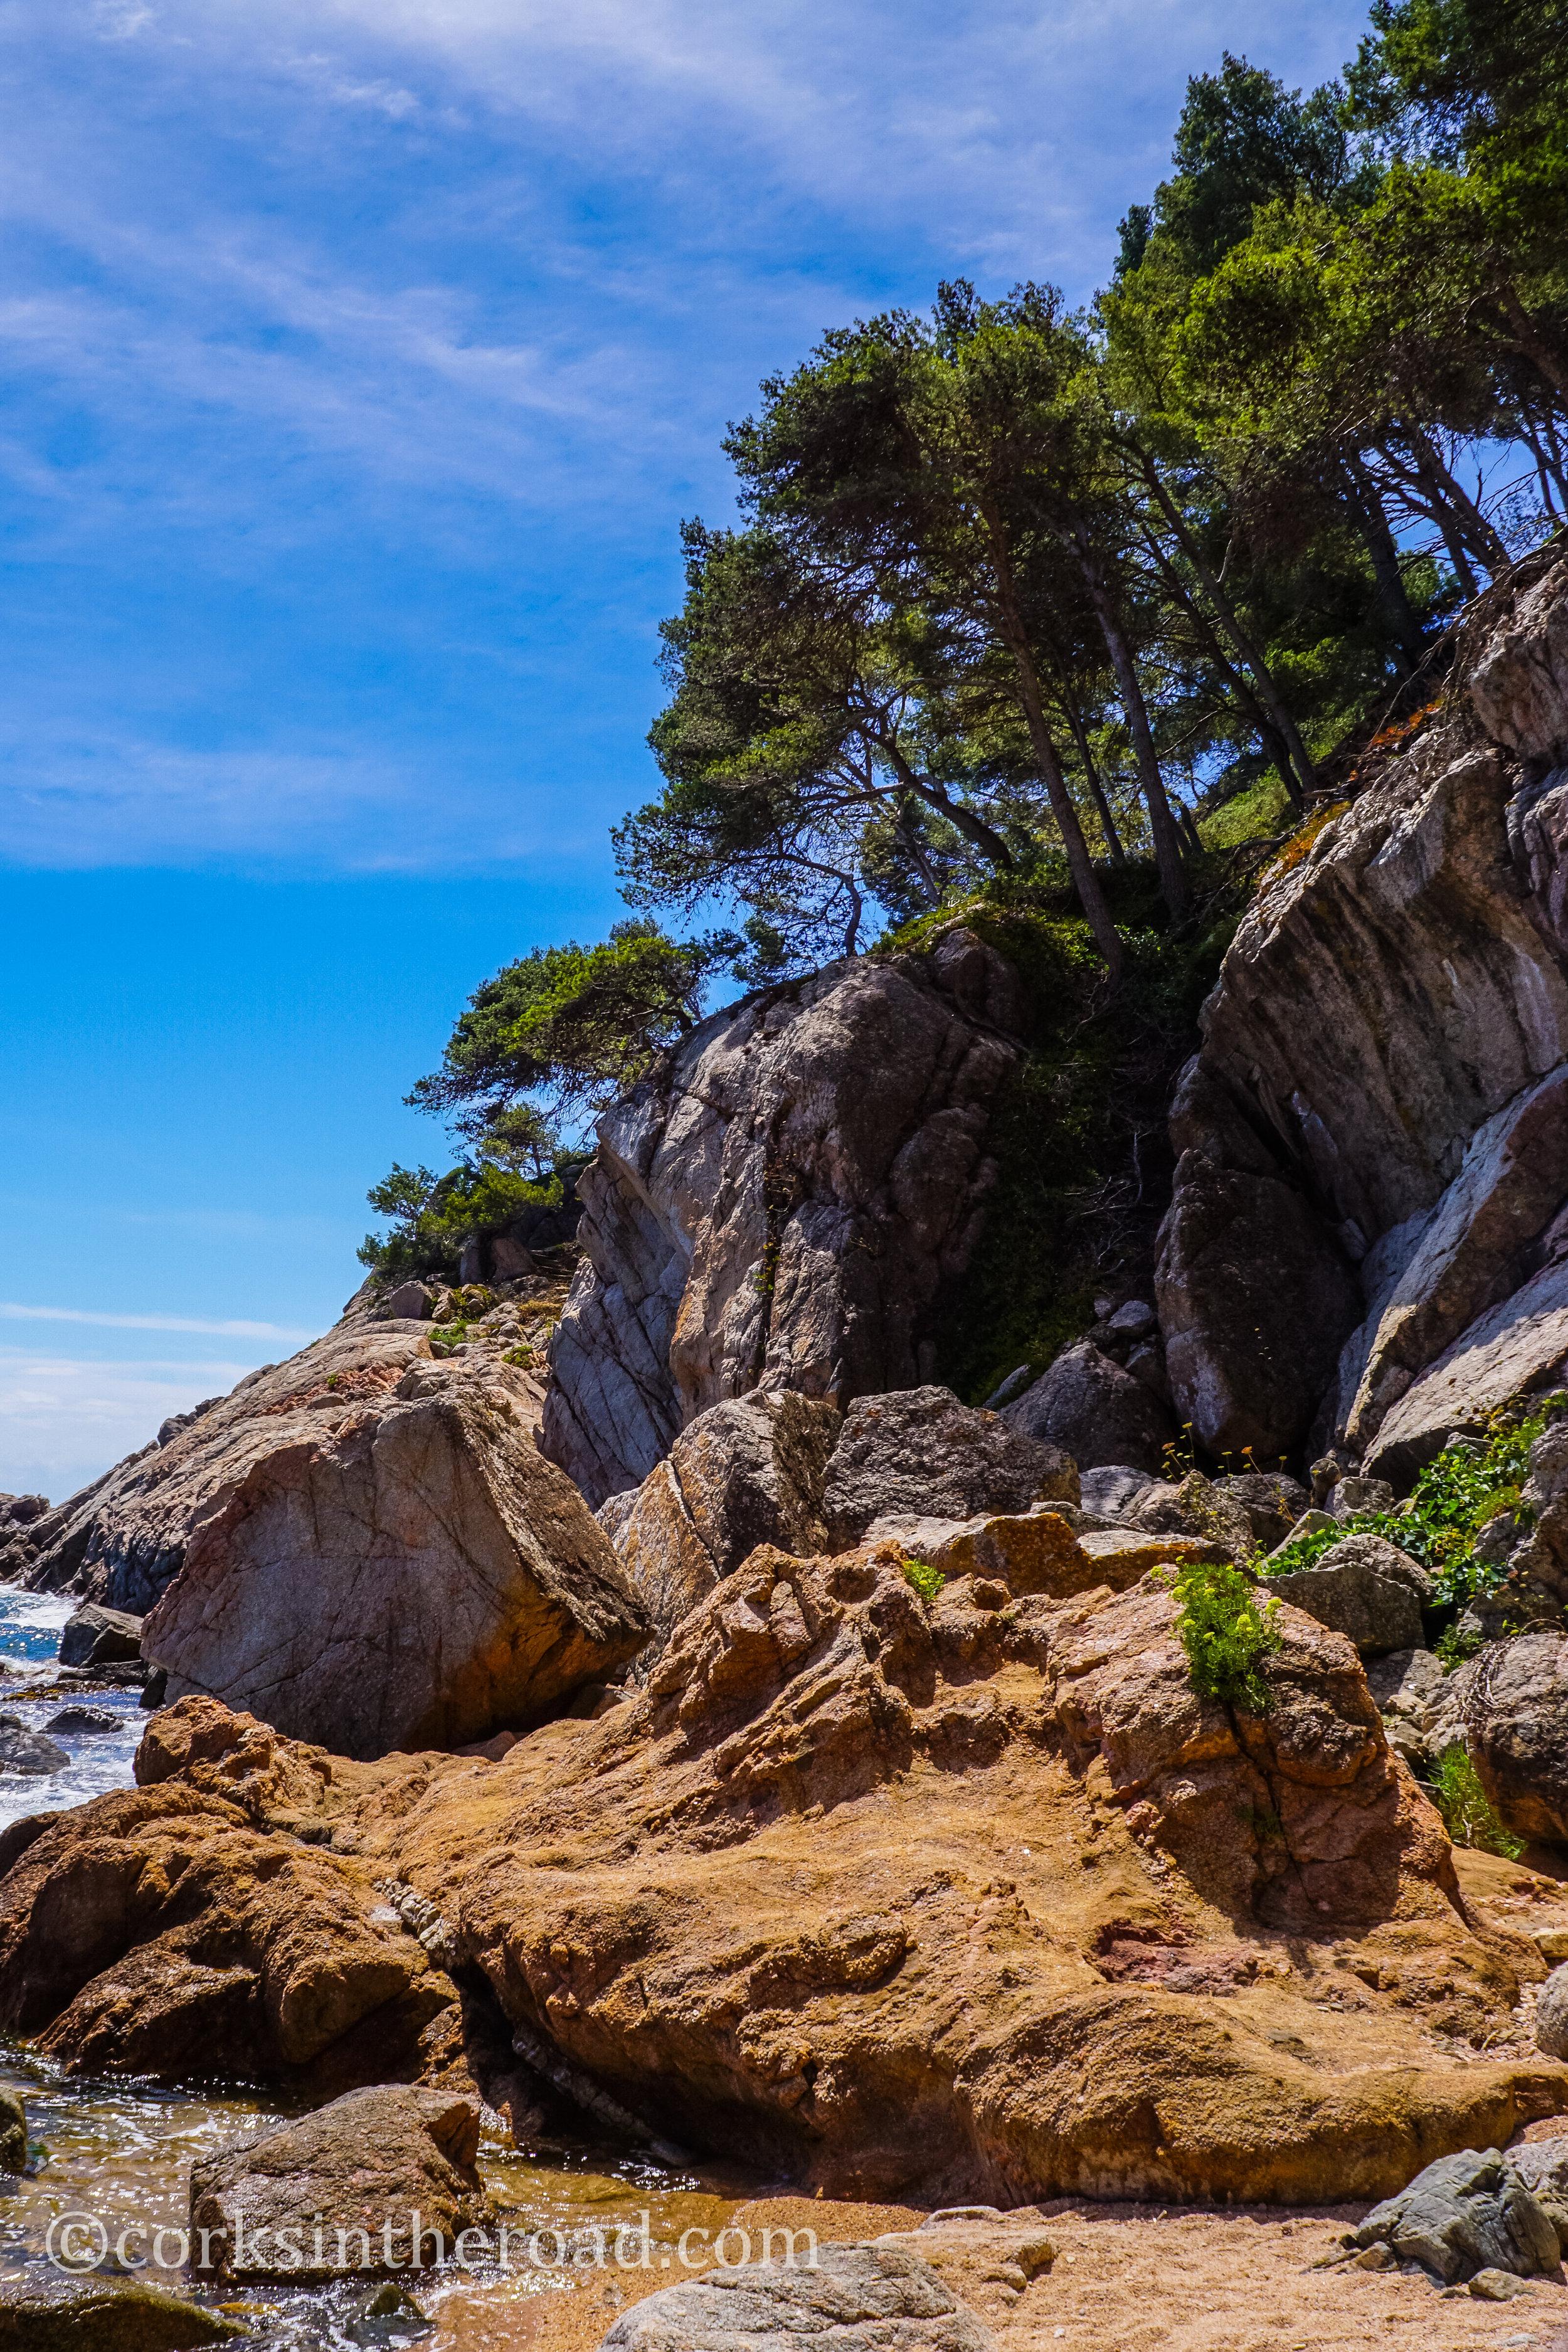 20160810Barcelona, Corksintheroad, Costa Brava, Costa Brava Landscape-37.jpg